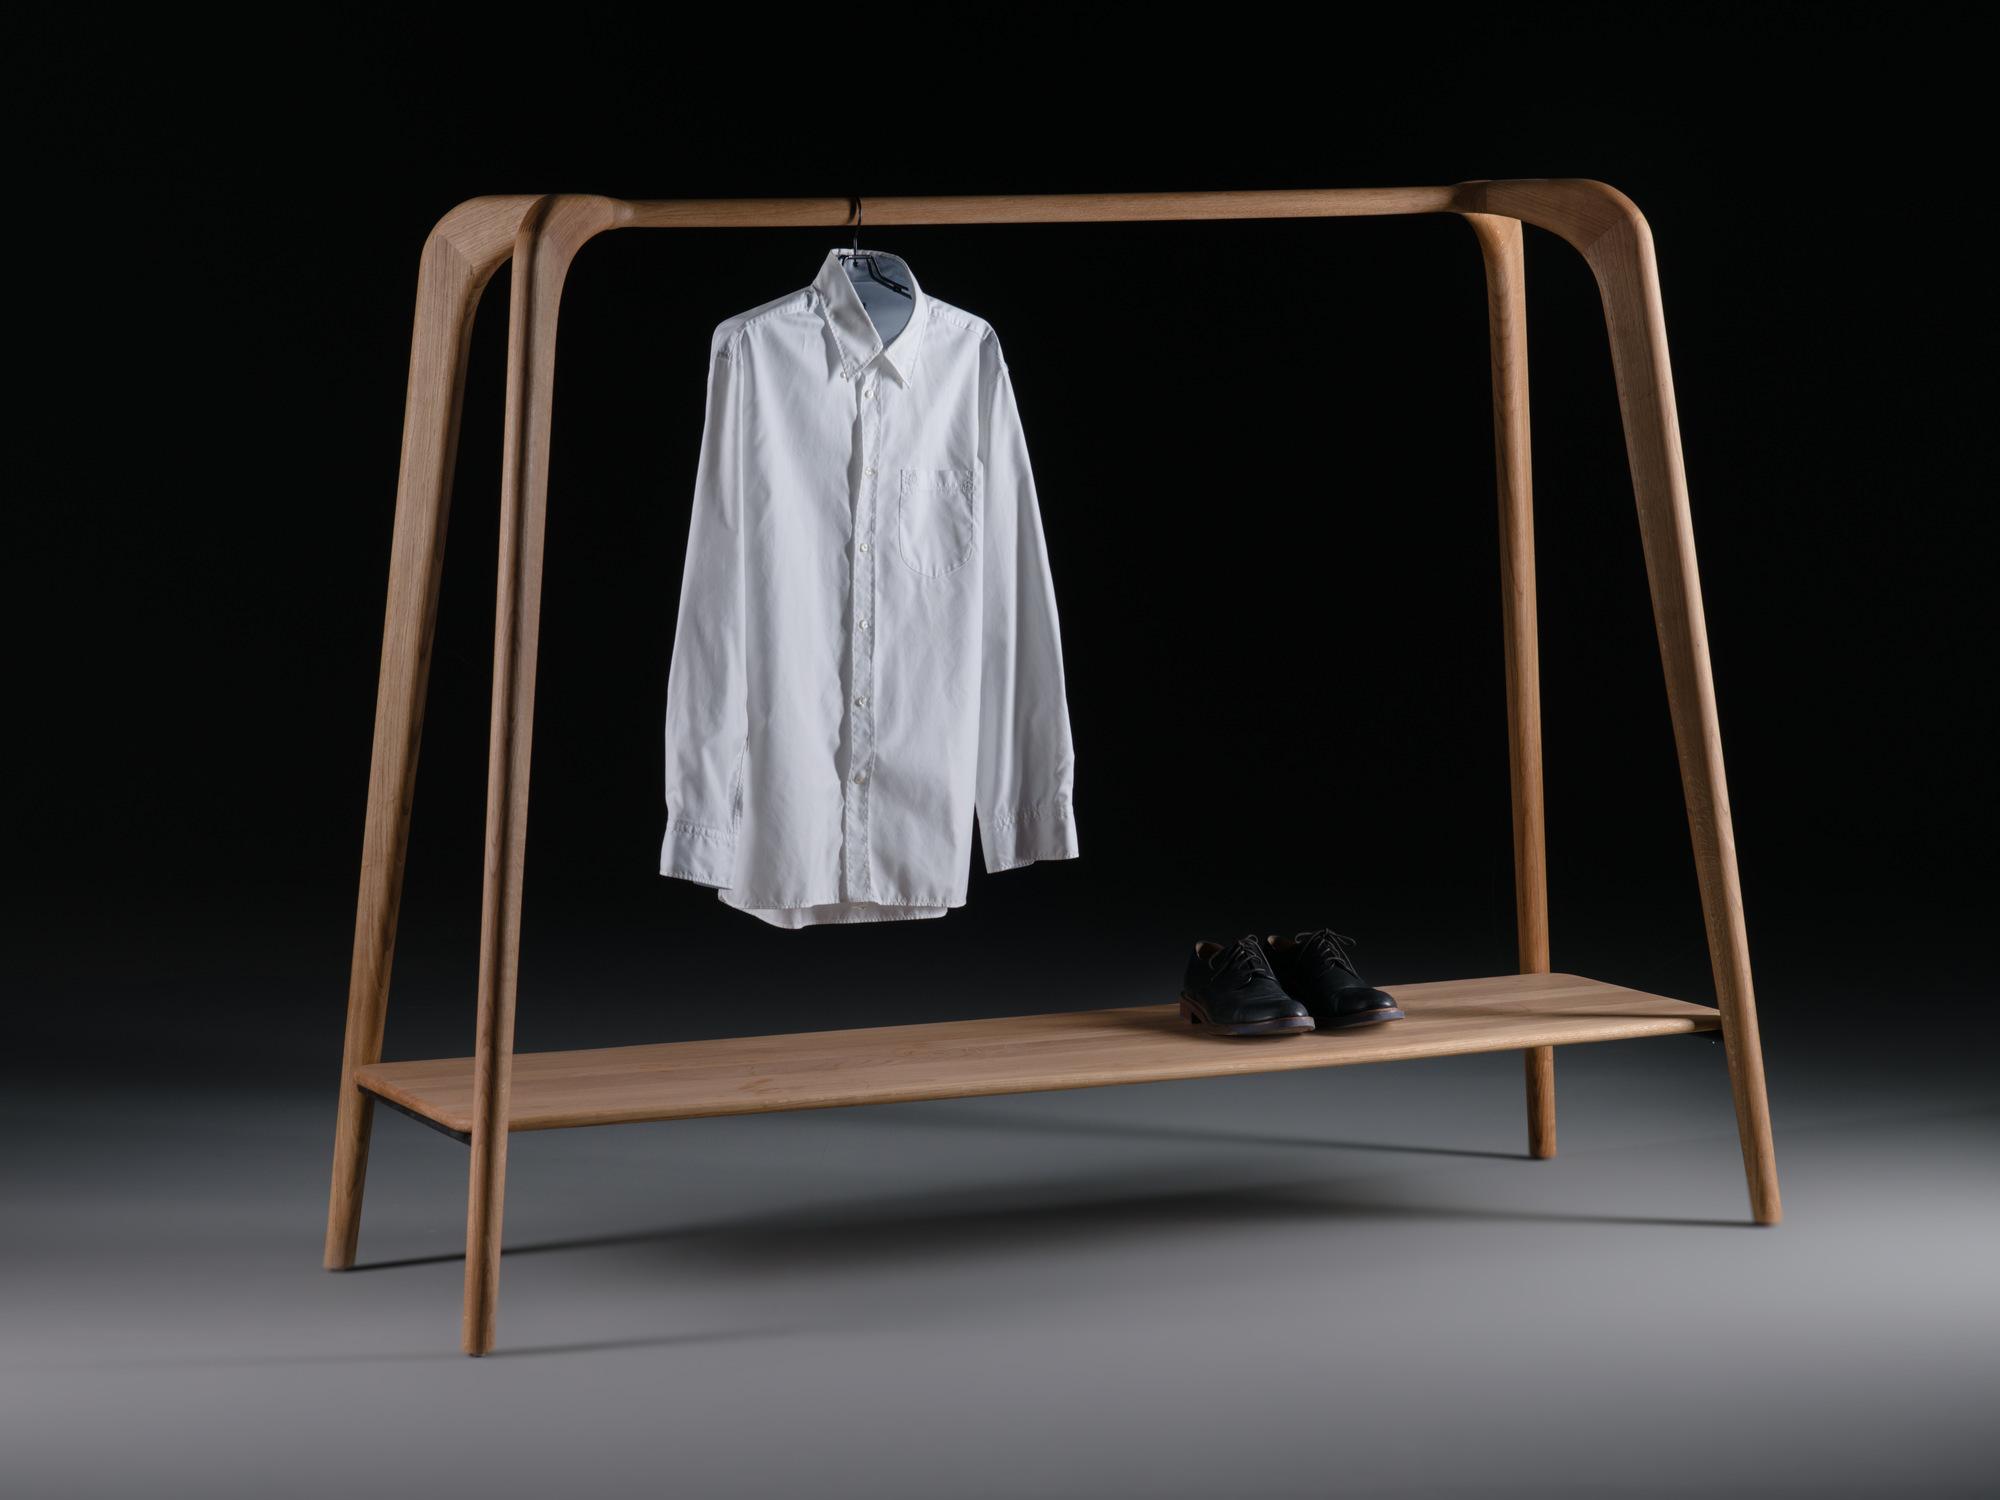 1546717340-garderobe-swing-garderobe-artisan.jpg